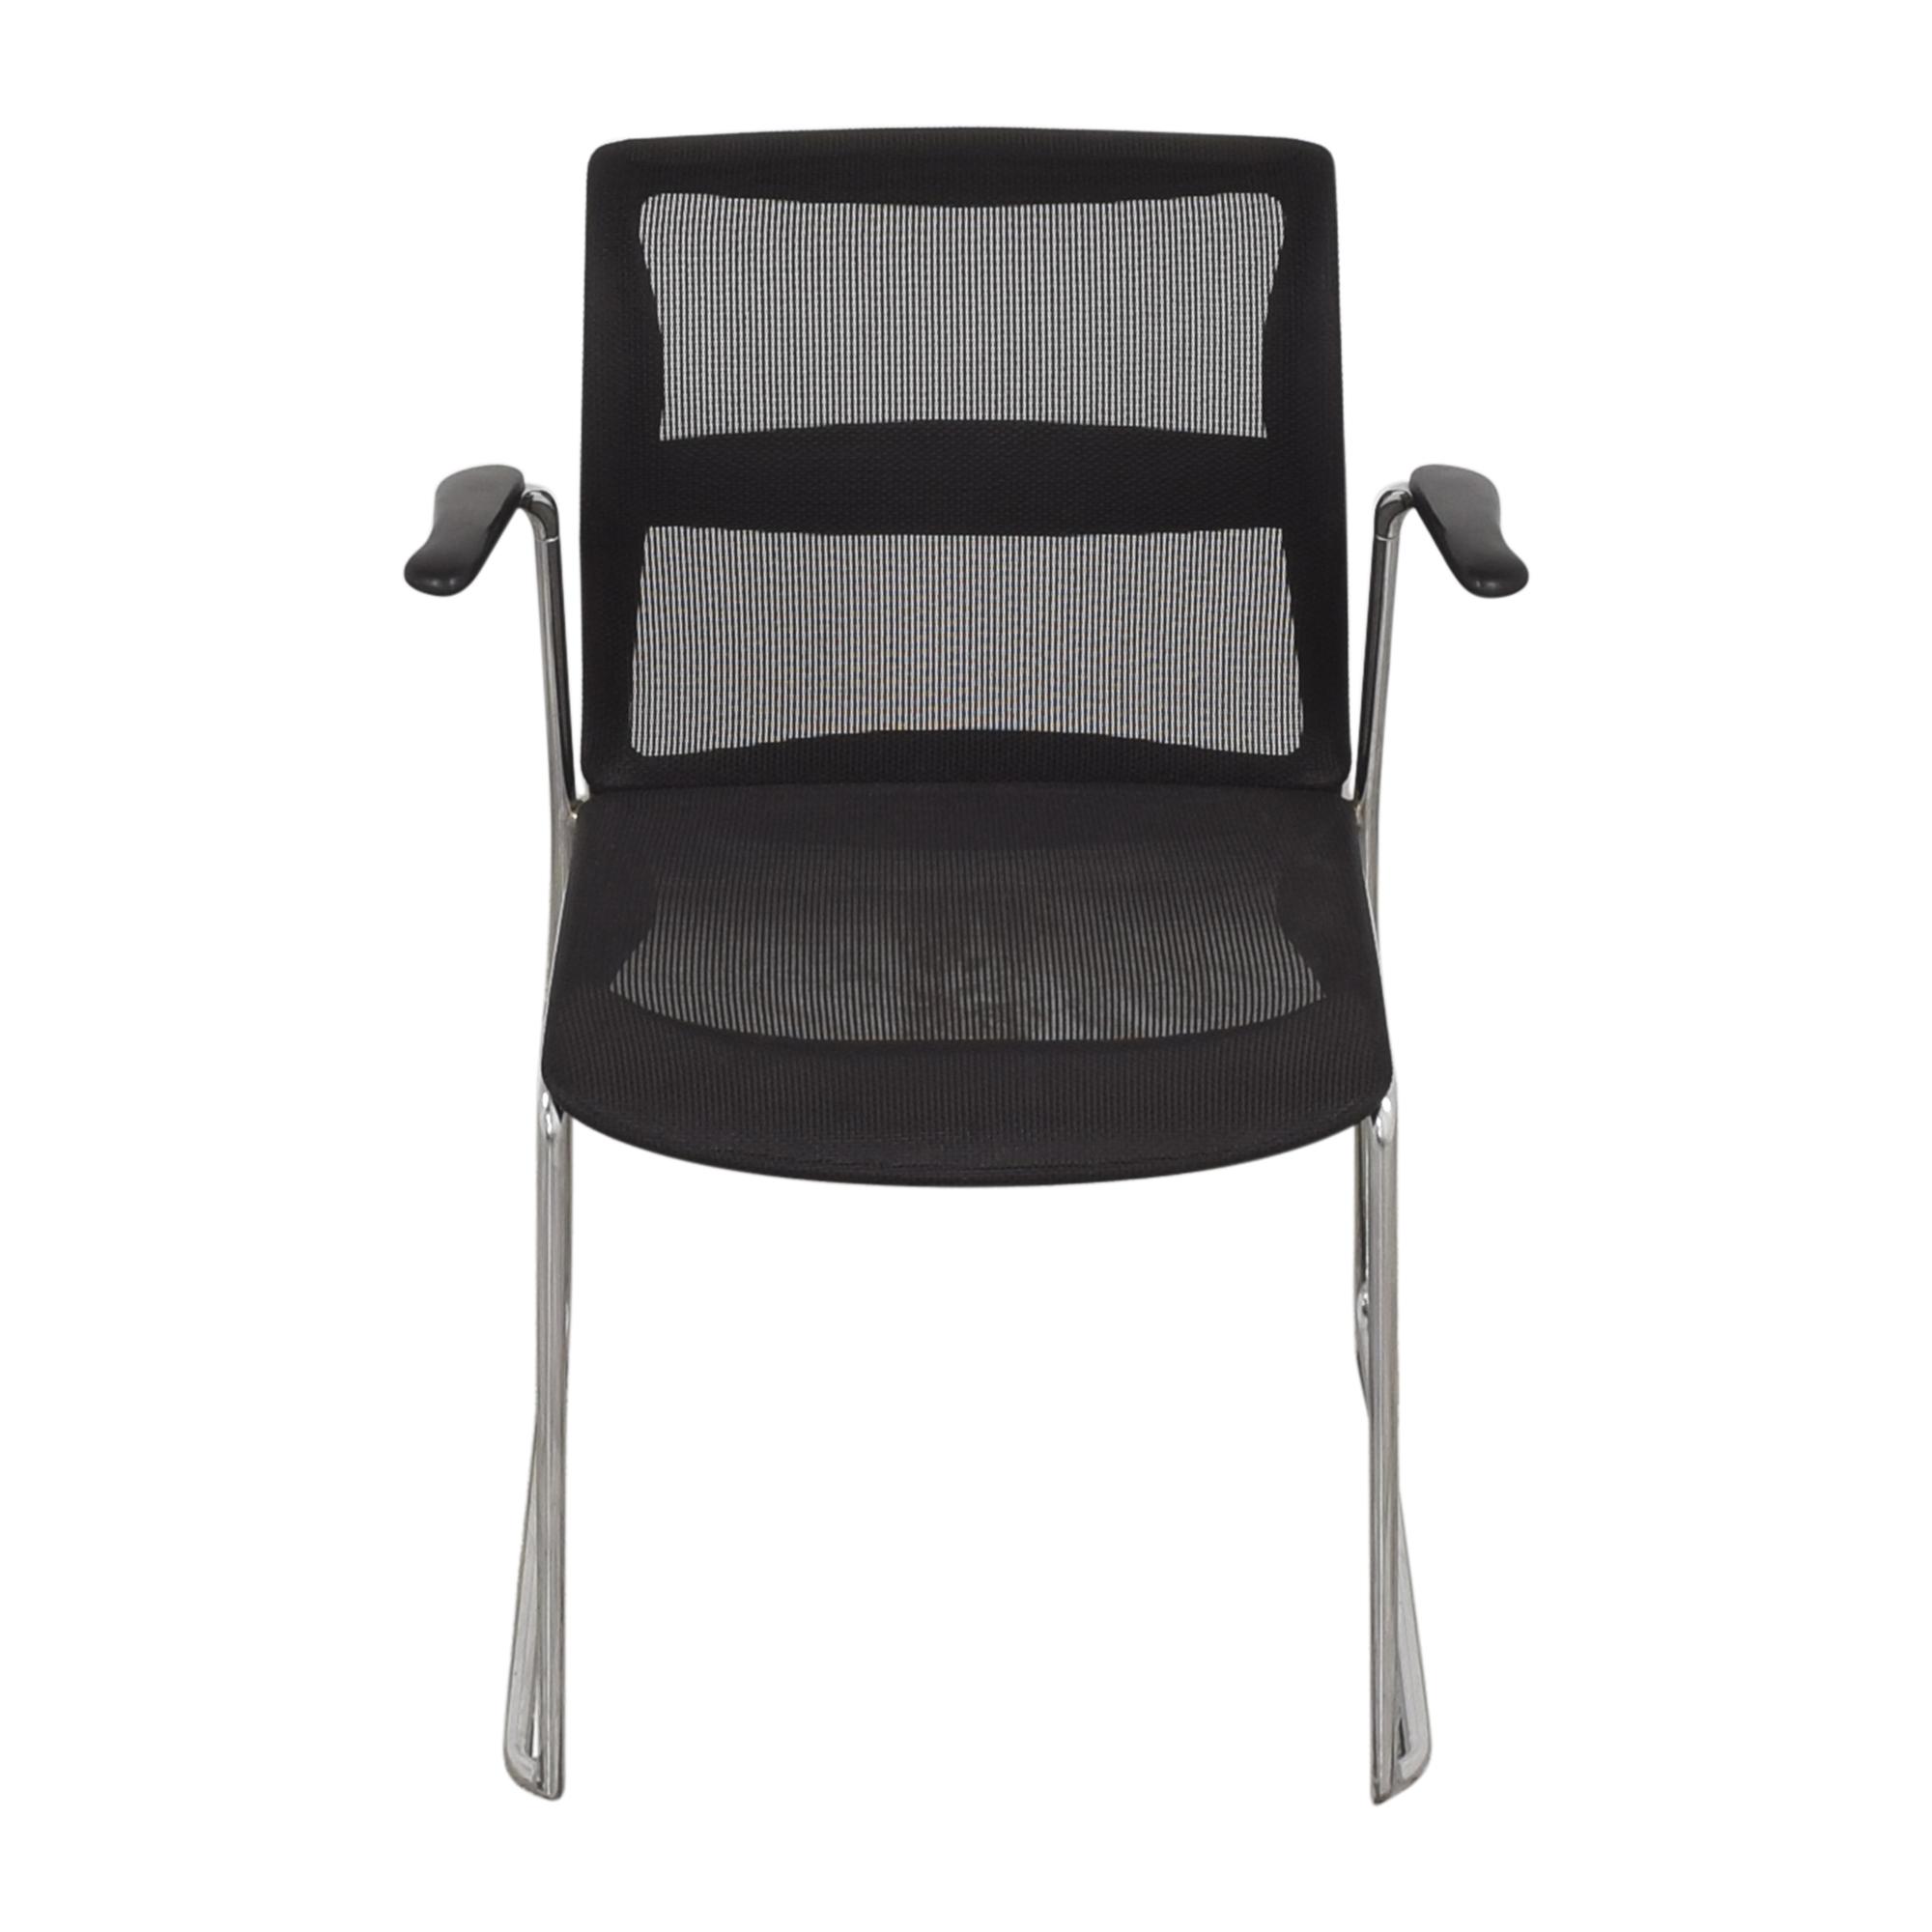 Stylex Stylex Zephyr Stacking Arm Chair